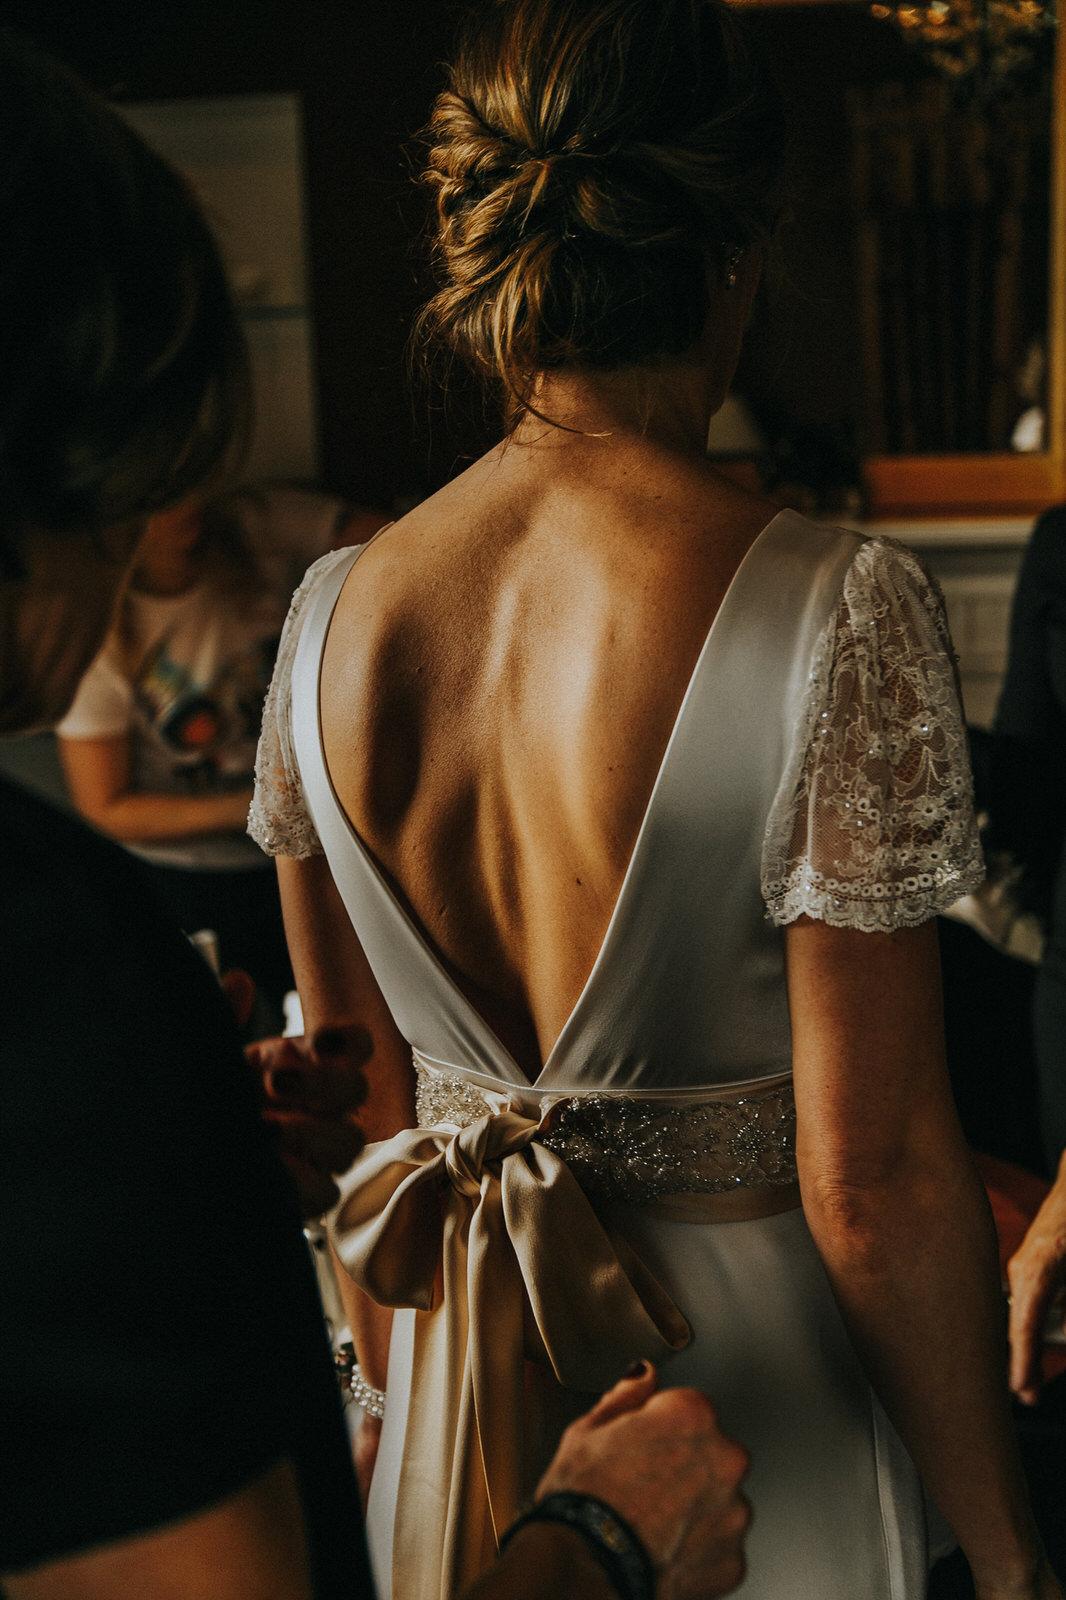 Dunbrody_House_Wedding_photographer_041.jpg